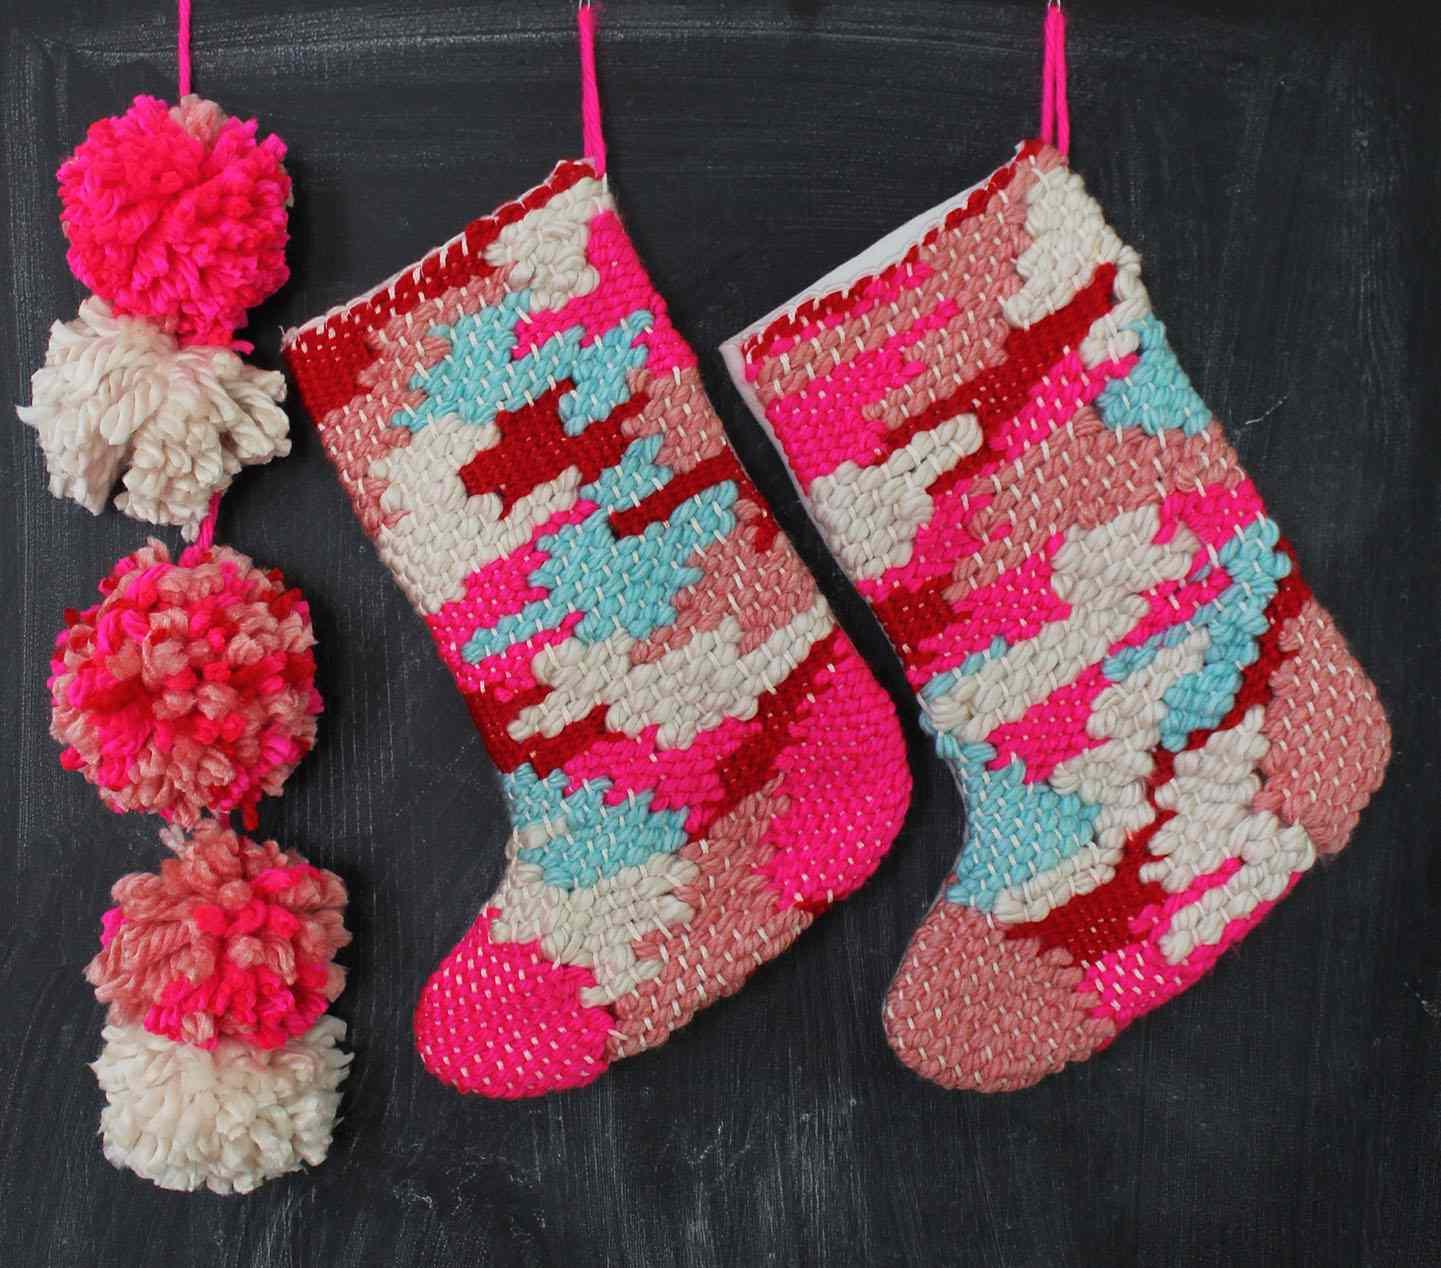 DIY Woven Stockings